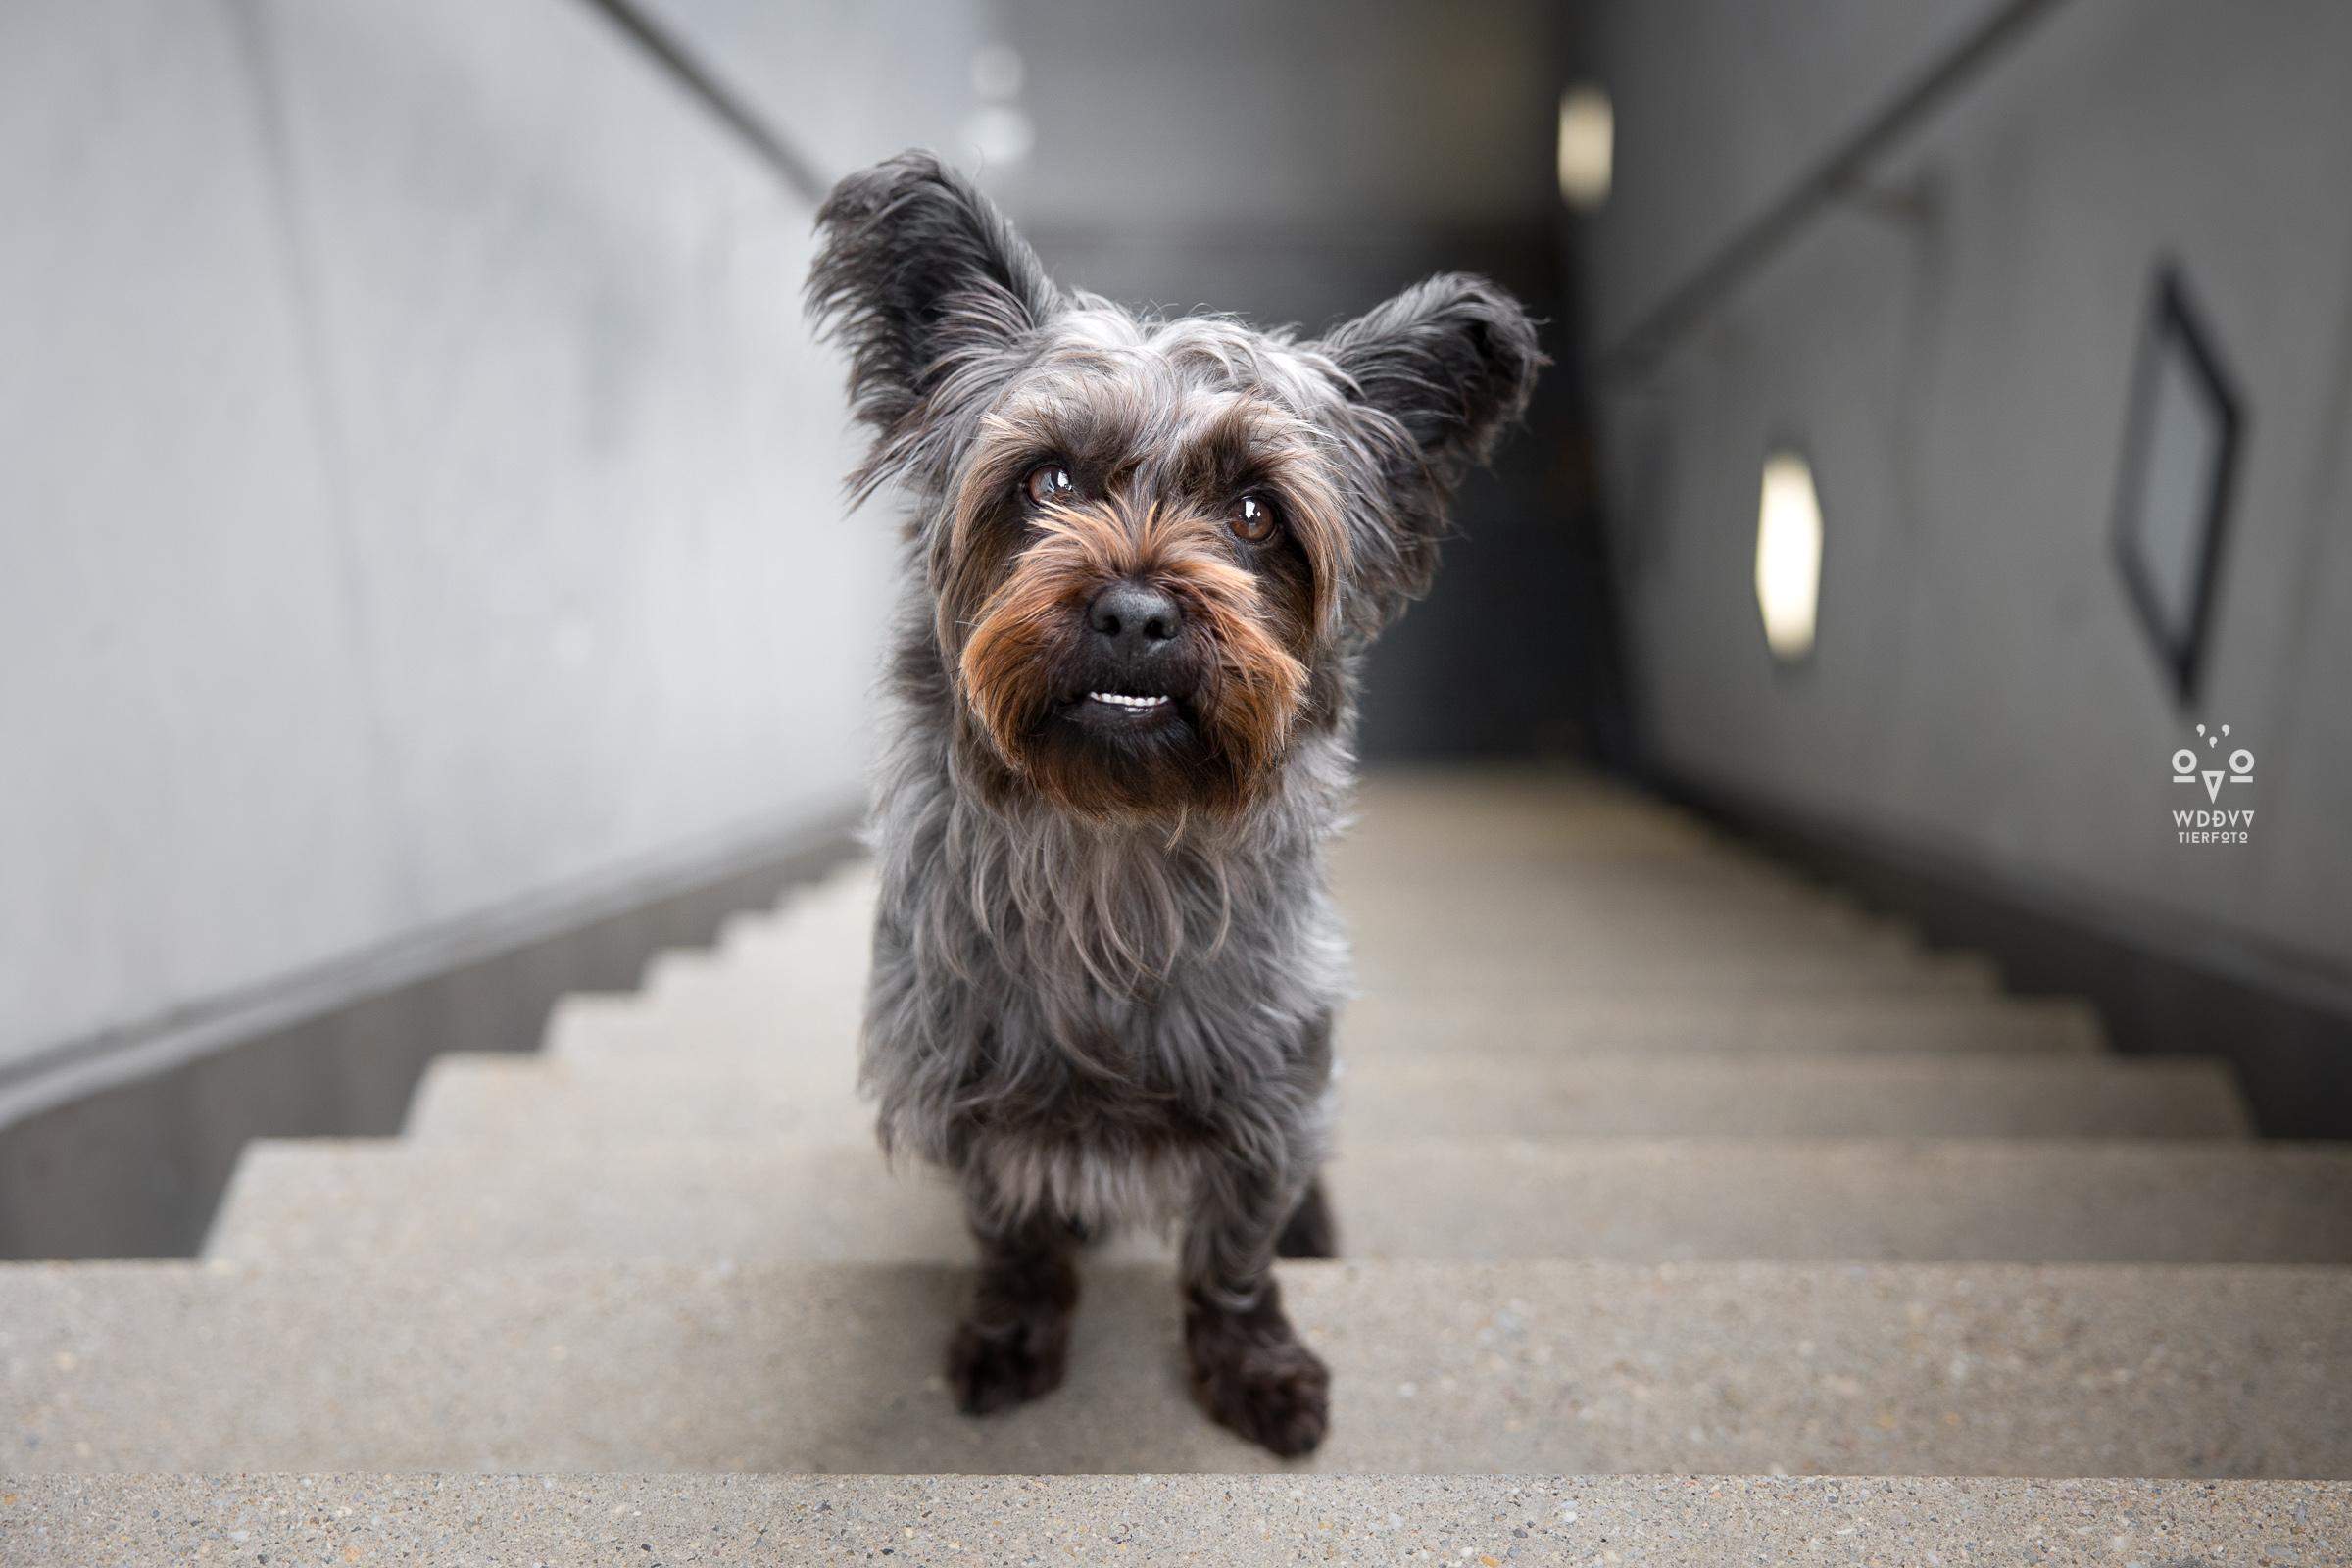 Wie das Ding vom Vogel Hundeshooting Tiershooting München Cityshooting Treppe